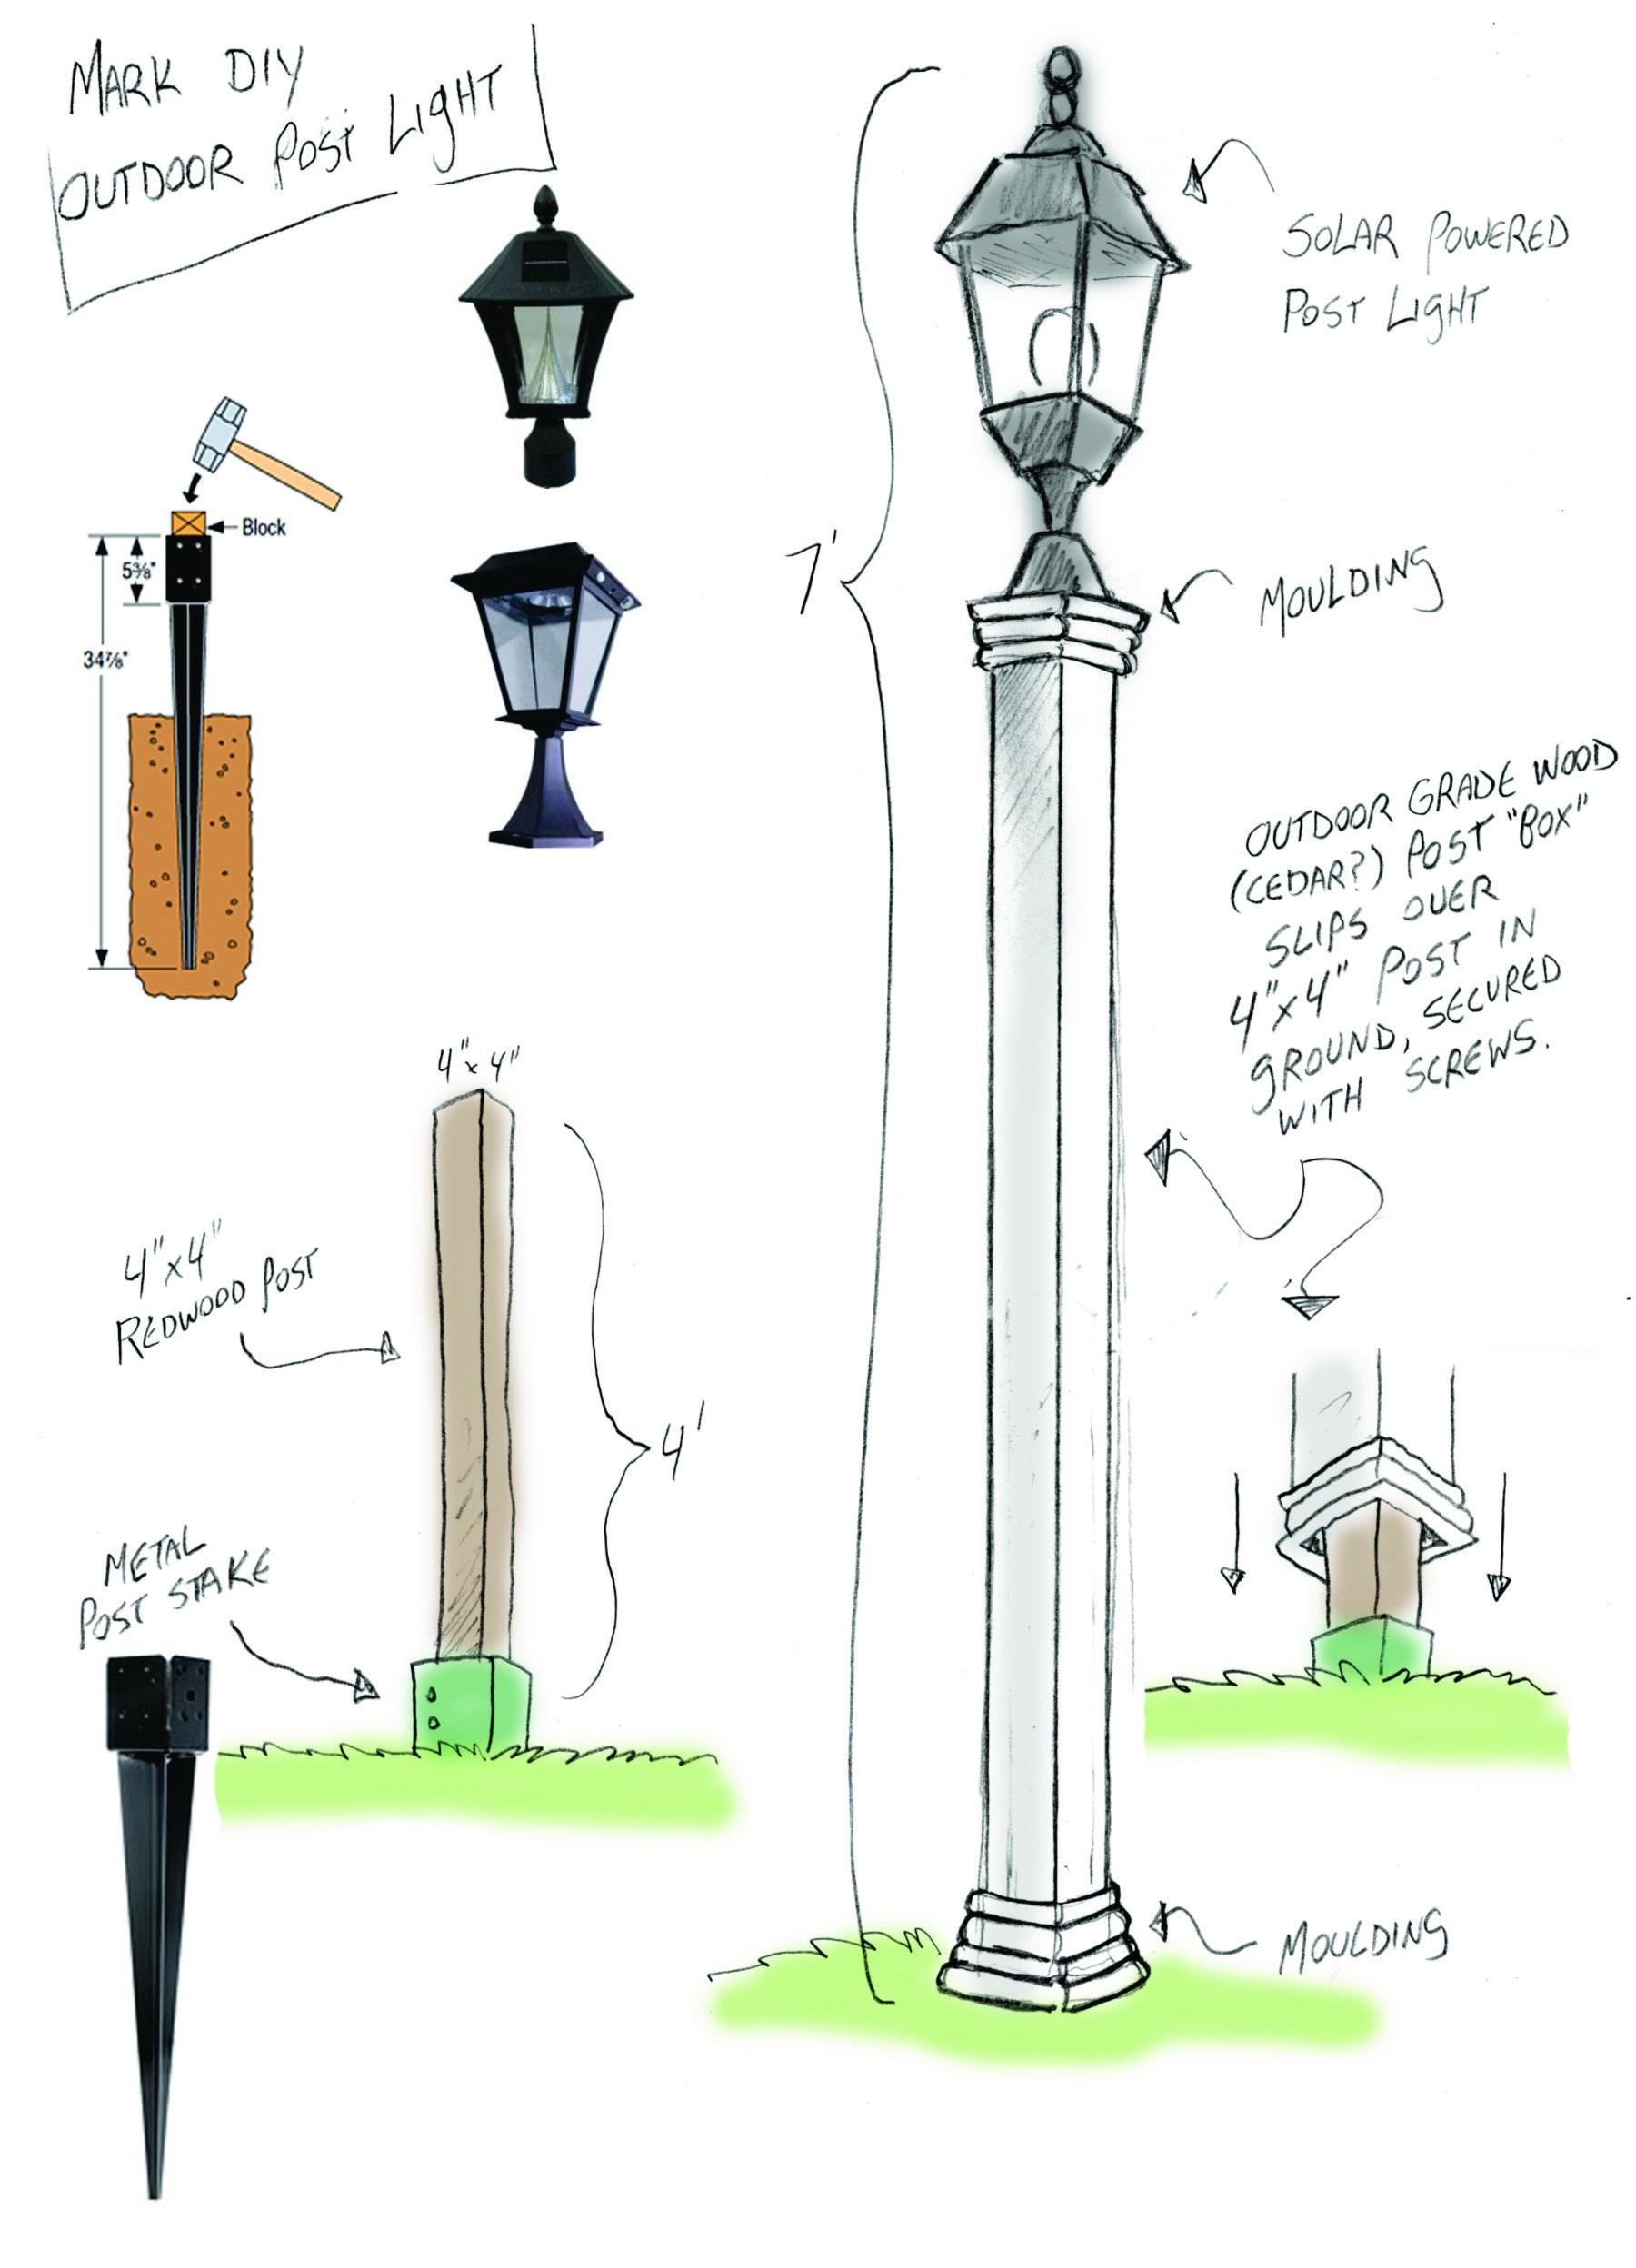 Outdoor Solar Lamppost Diy